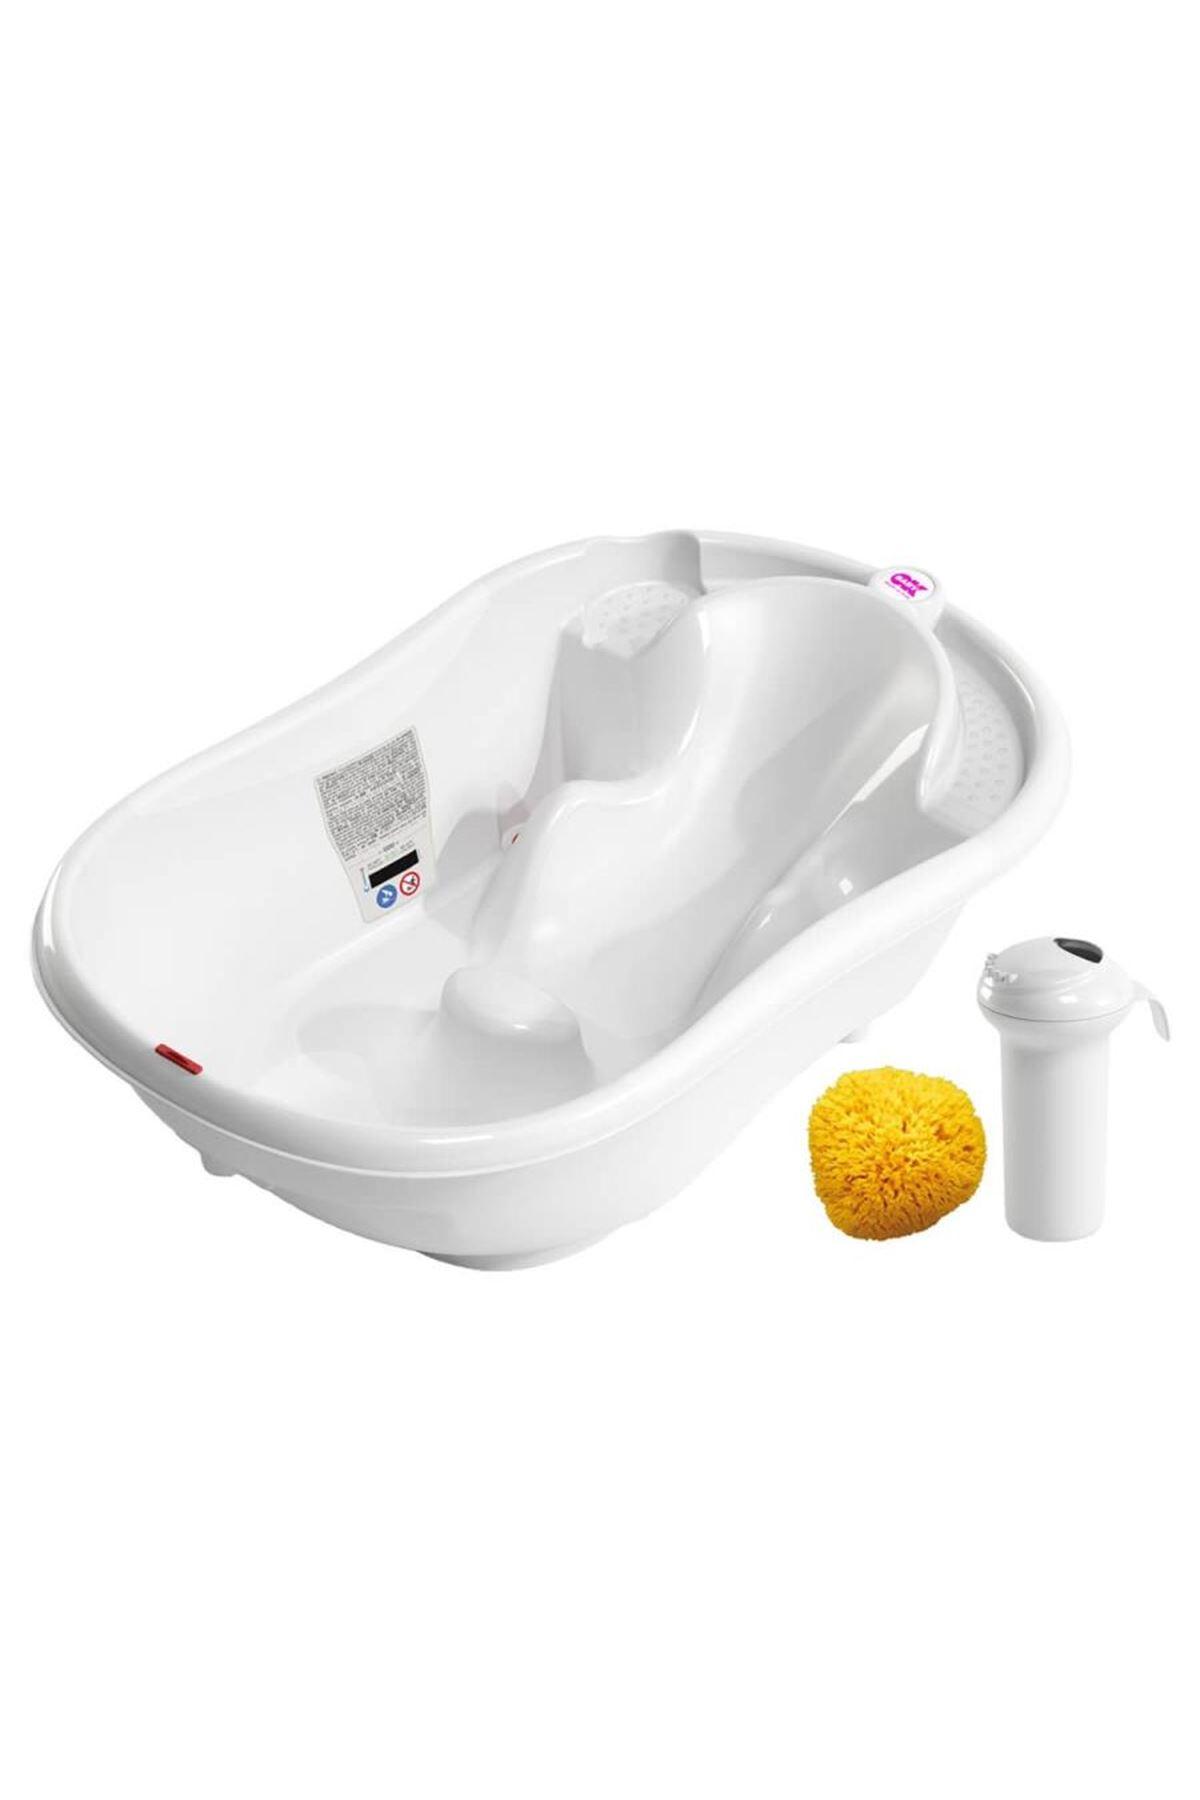 OkBaby Onda Banyo Küveti & Splash Bebek Duşu & Doğal Banyo Süngeri No.10 / Beyaz